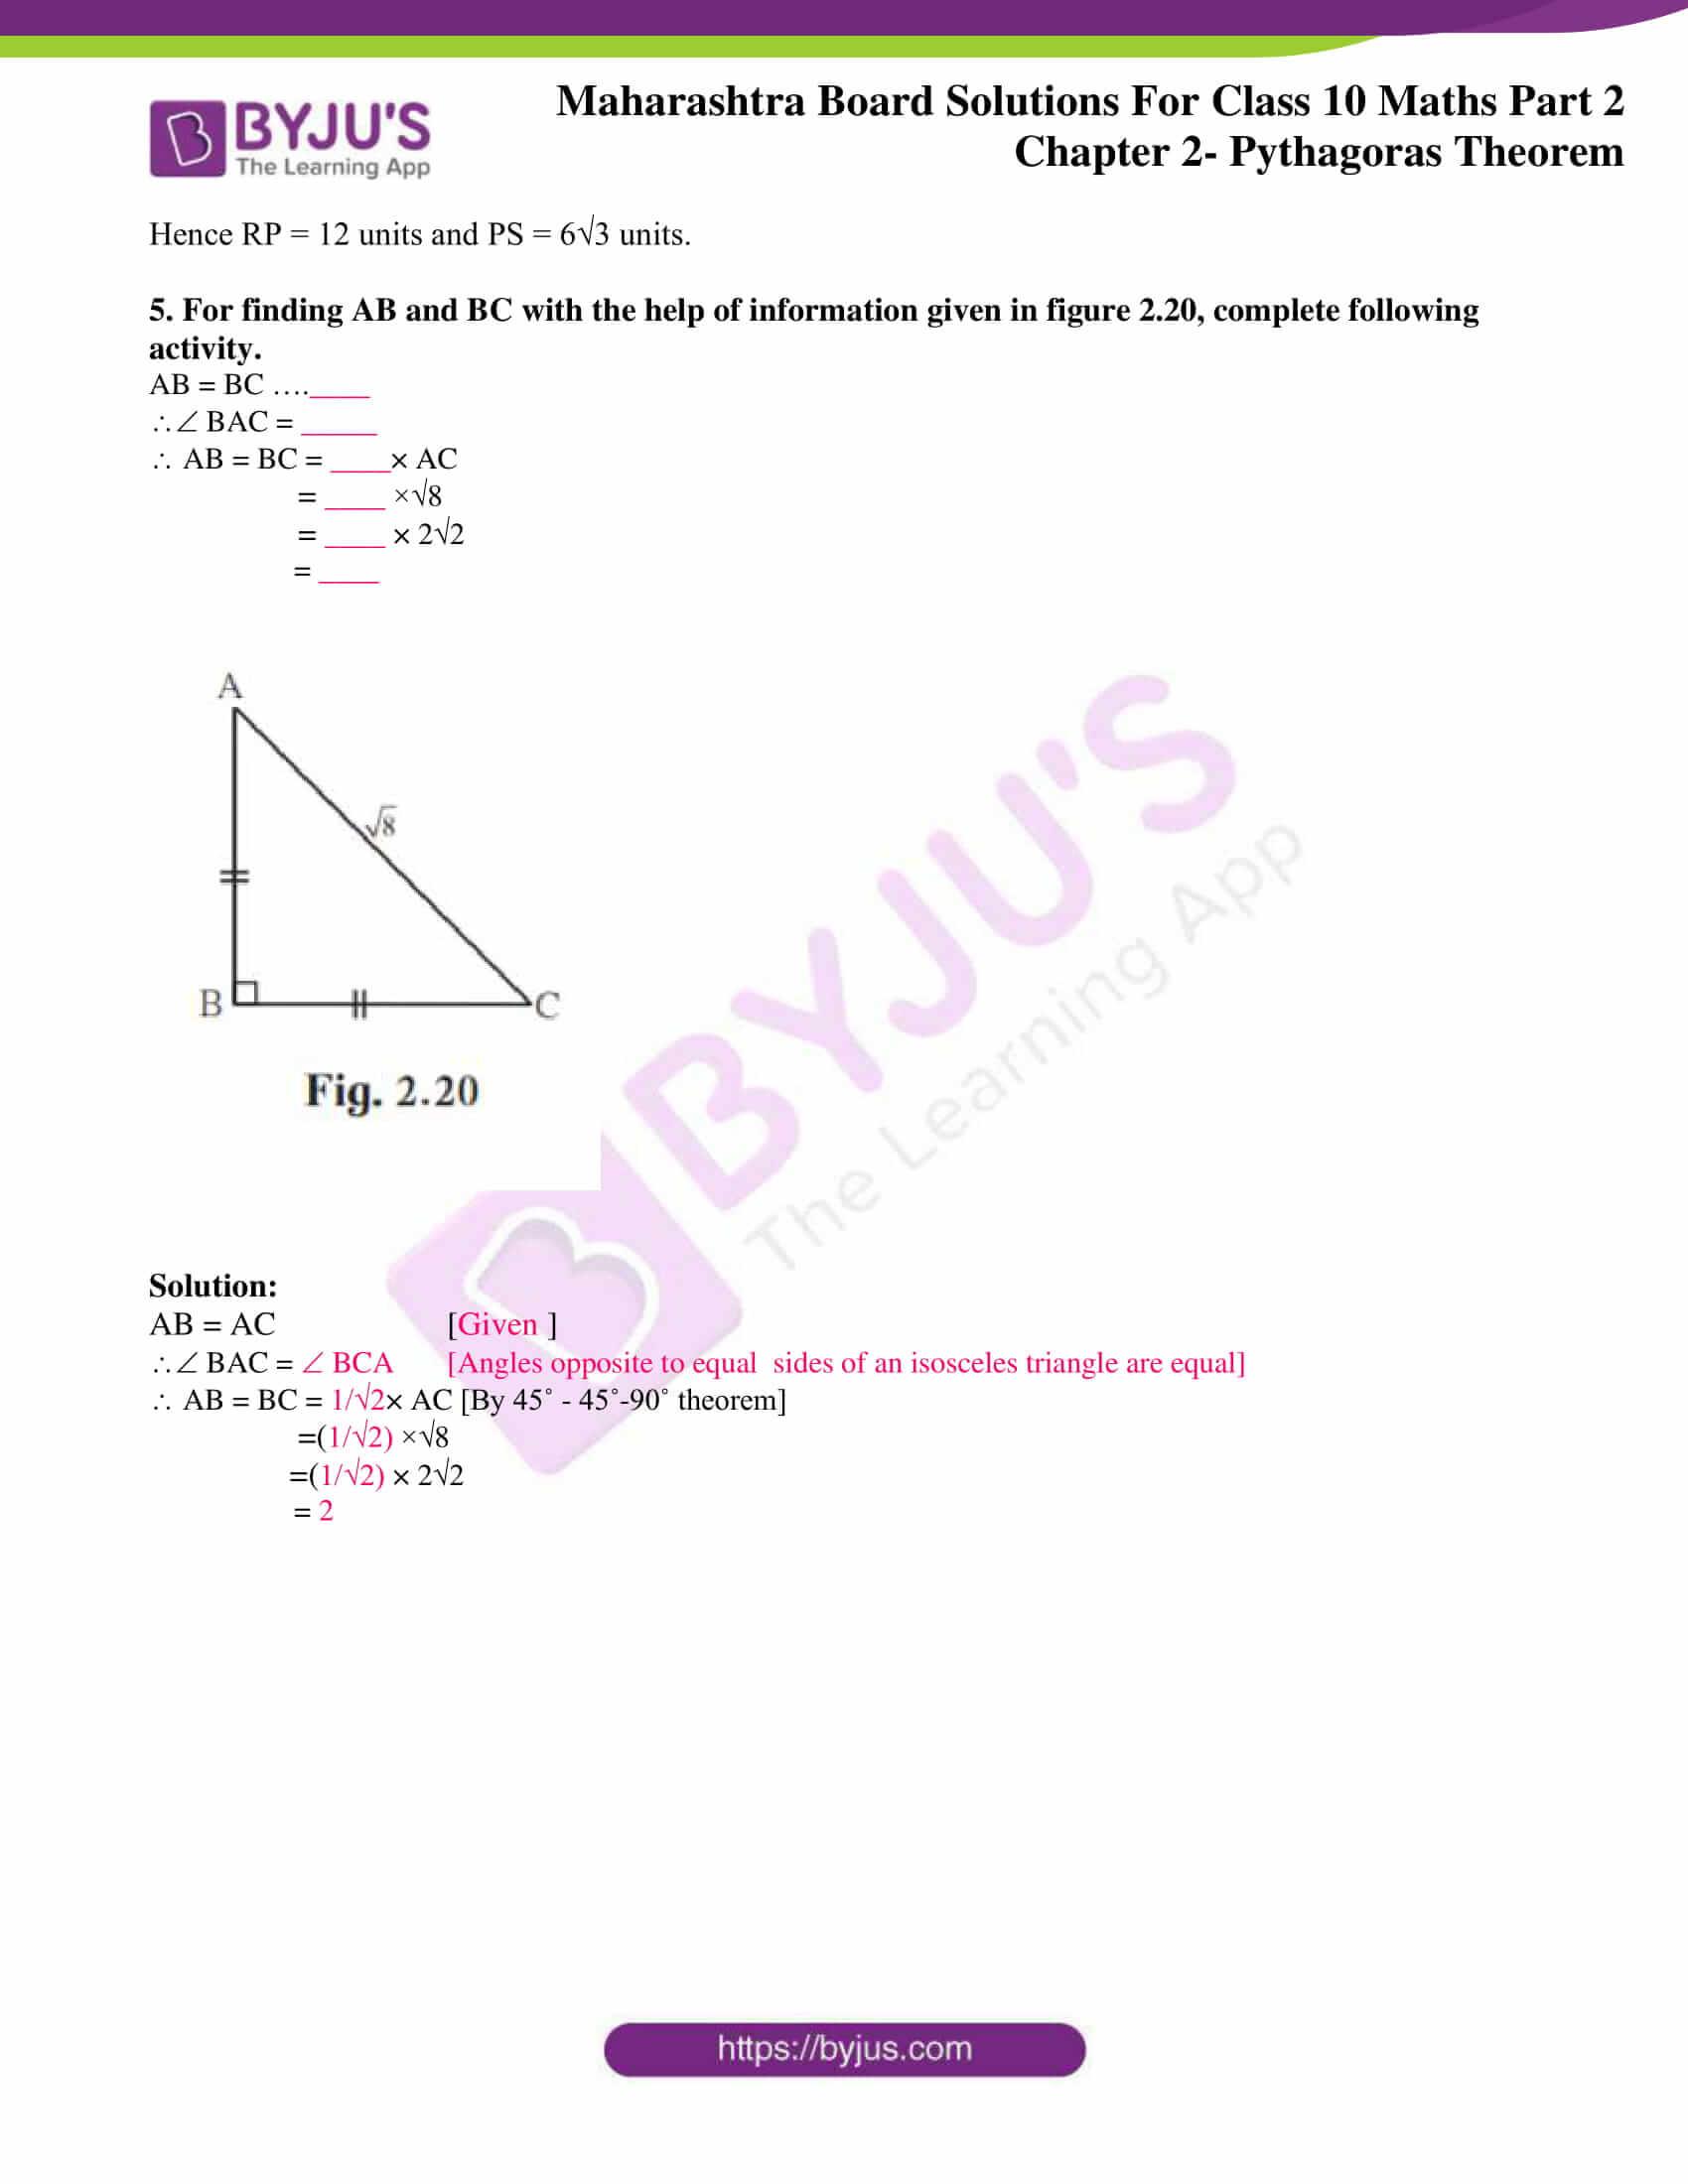 msbshse sol class 10 maths part 2 chapter 2 04